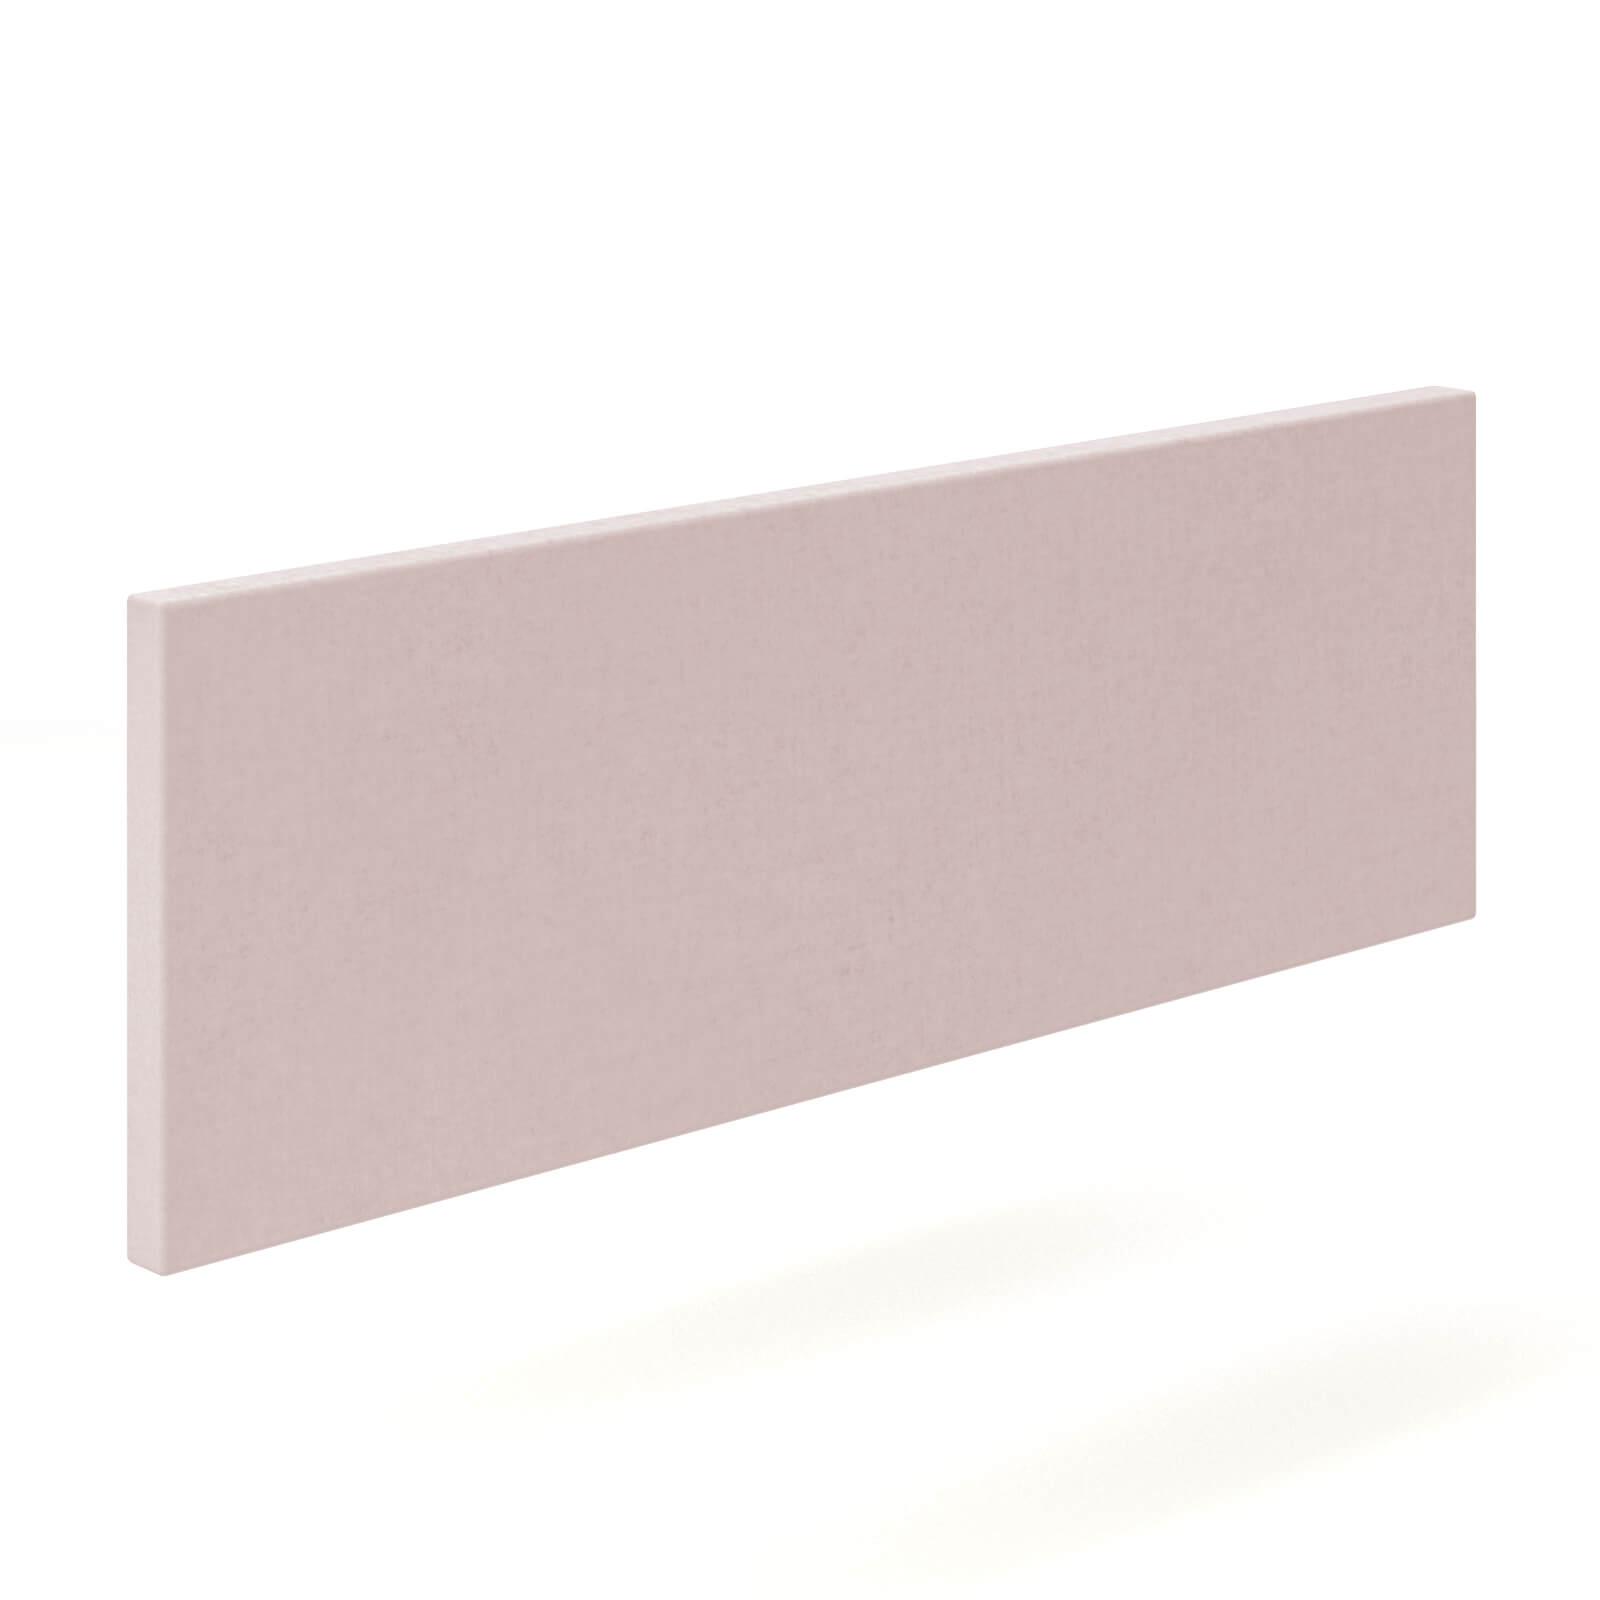 Akustik Deckensegel MODUS 1.200 x 400 mm horizontal Akustikplatten Paneel Filz